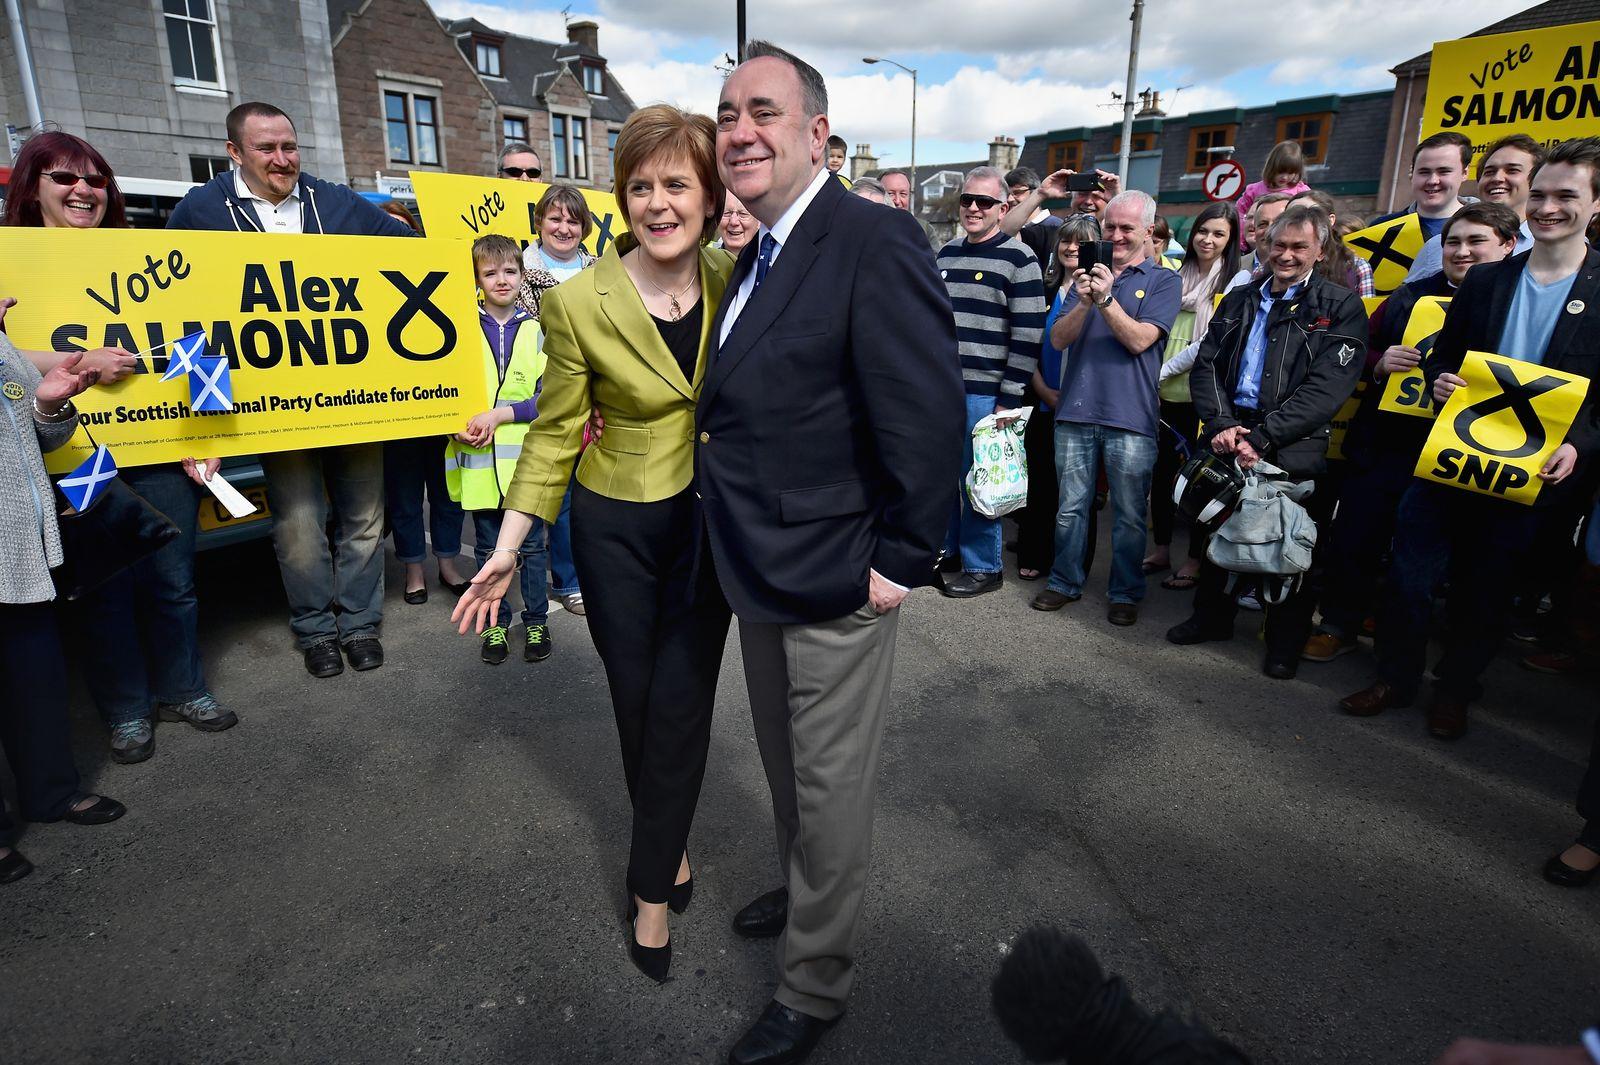 Nicola Sturgeon Joins Alex Salmond On The Campaign Trail